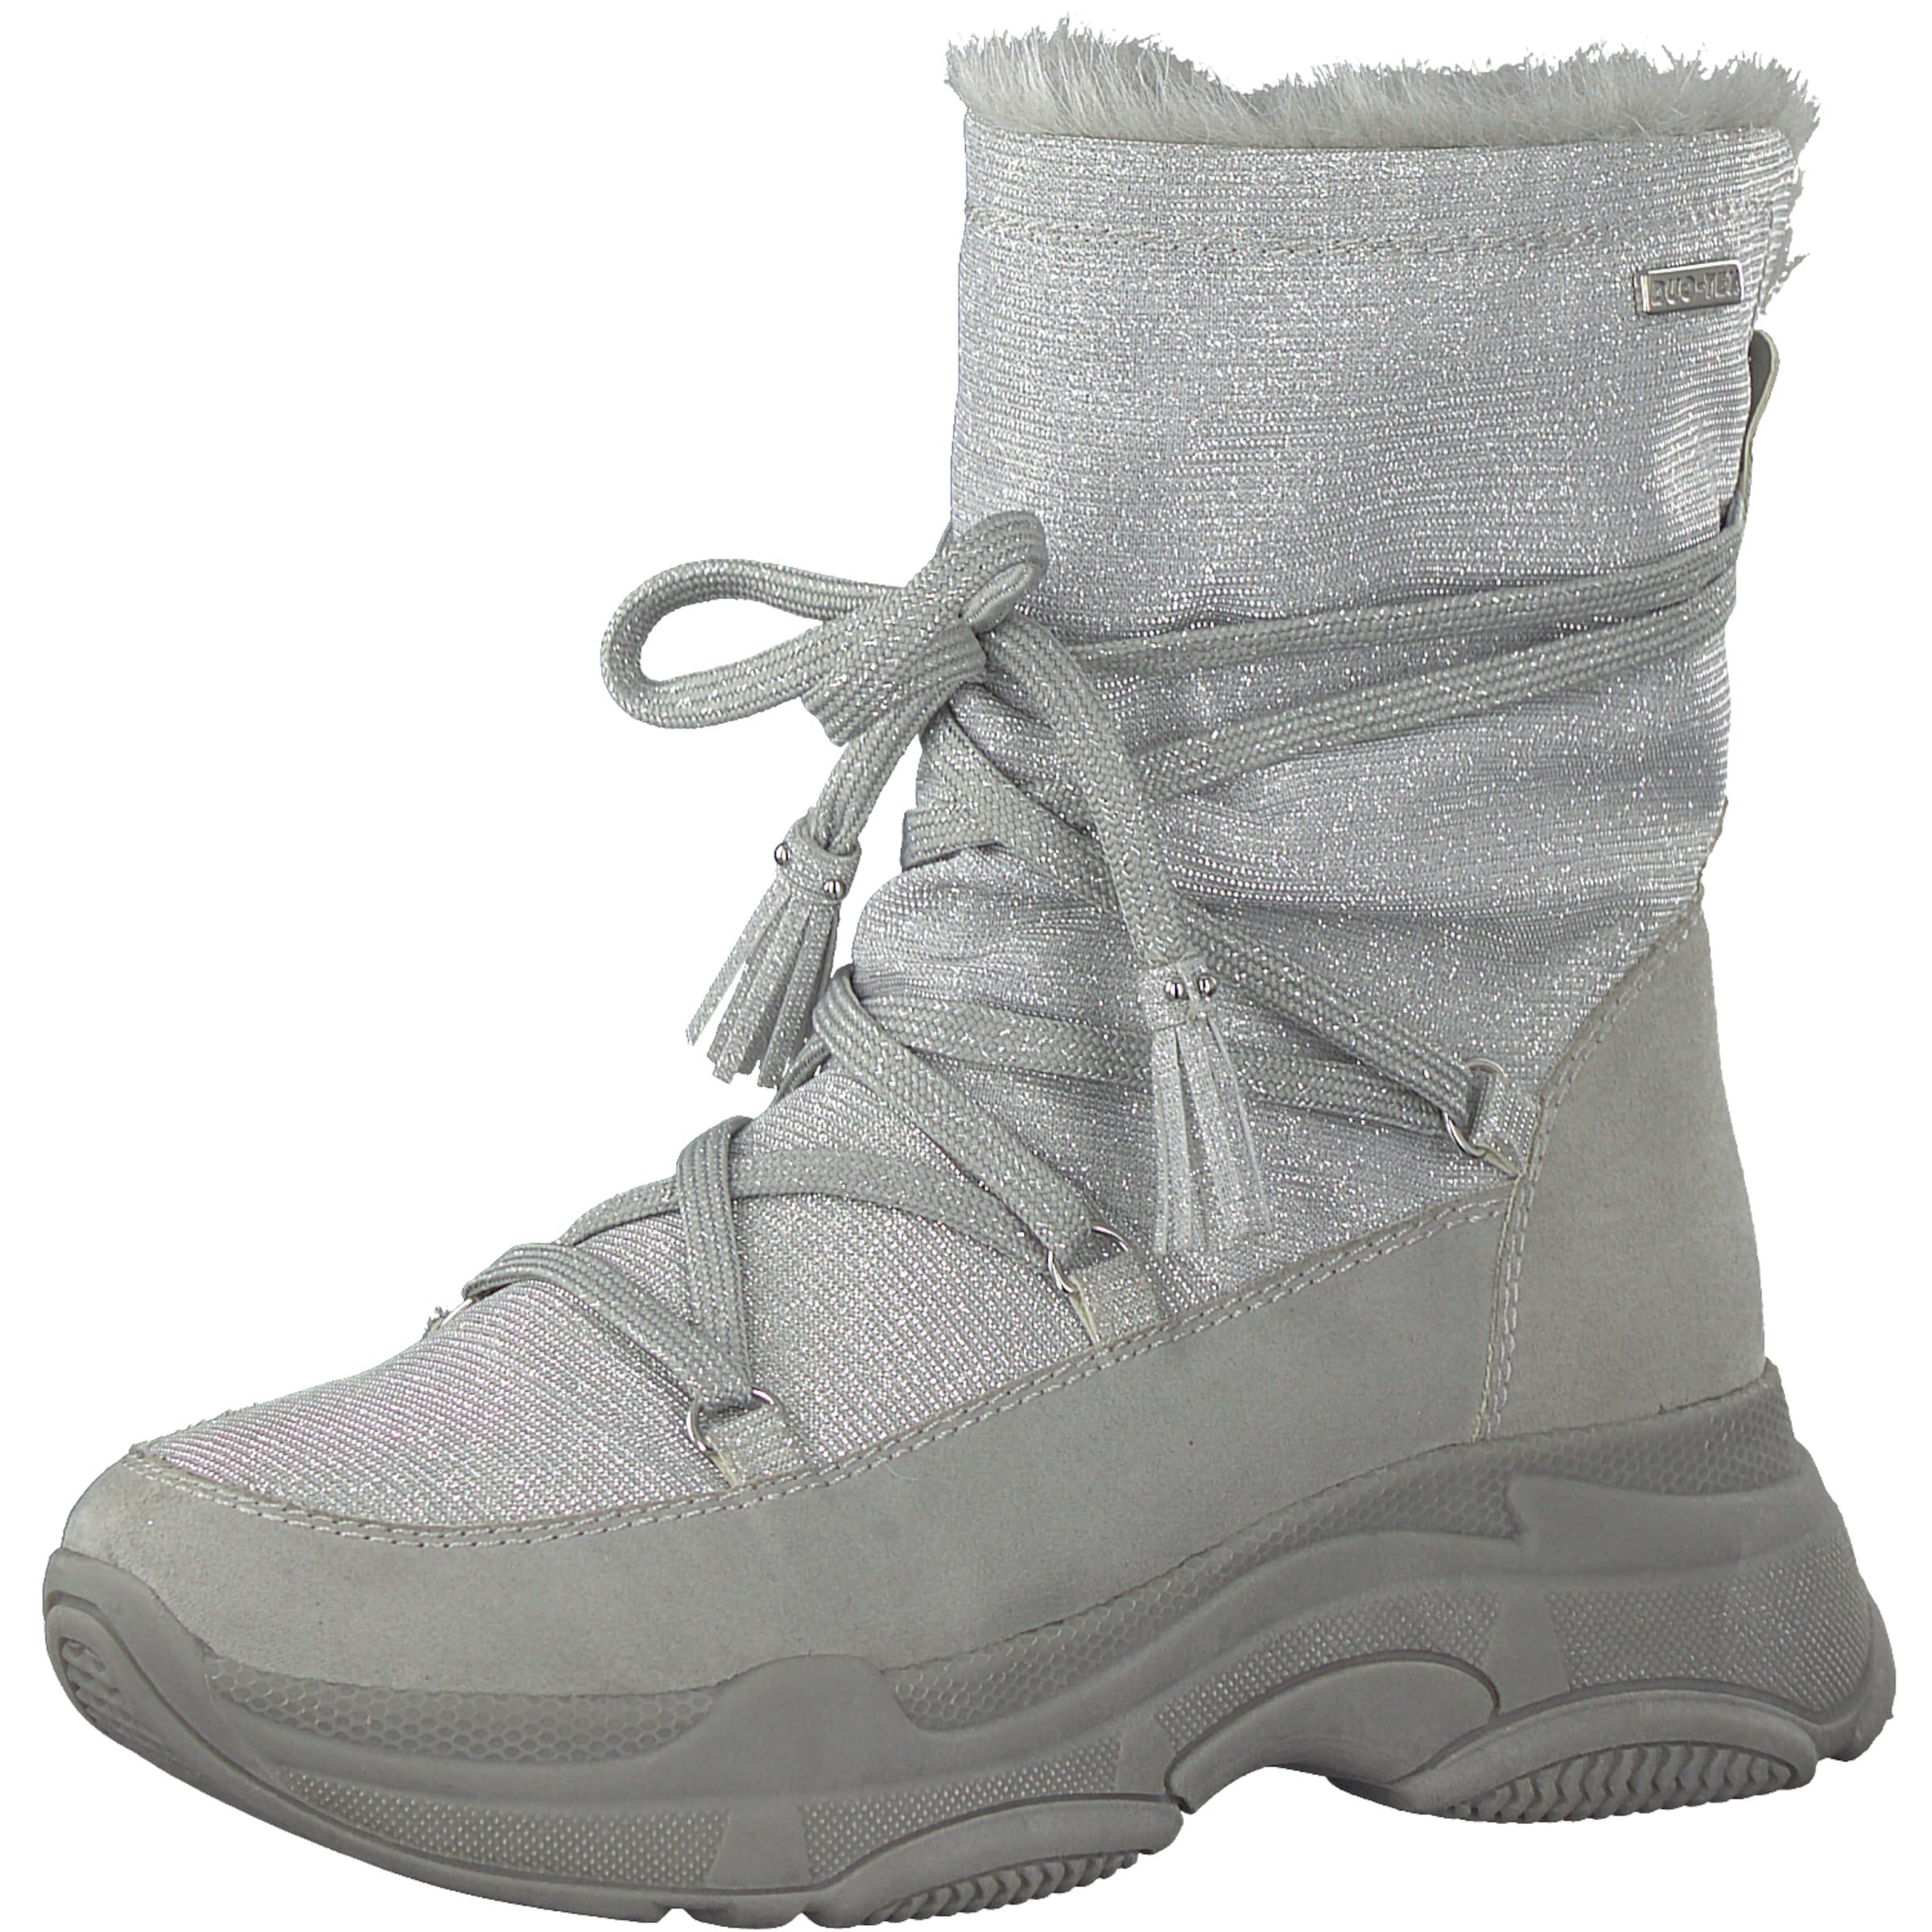 Grijs Tamaris Boots In Tamaris Boots Boots Grijs In In Tamaris Grijs nkw0P8O